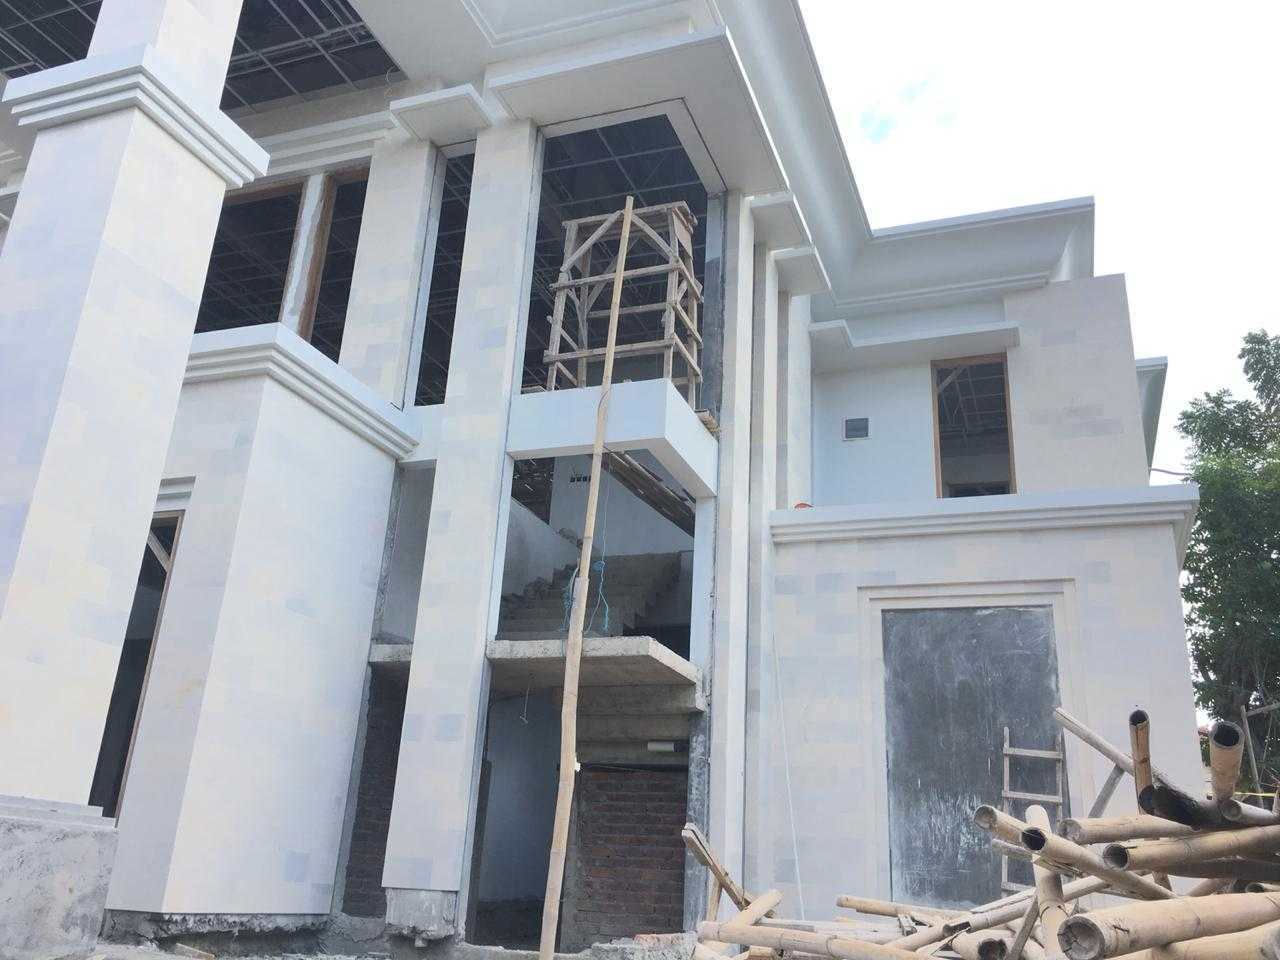 Emporio Architect In Progress Villa Bali Tropis 216  @ Denpasar Kota Denpasar, Bali, Indonesia Kota Denpasar, Bali, Indonesia Emporio-Architect-Progress-Villa-Bali-Tropis-216-Denpasar  75651